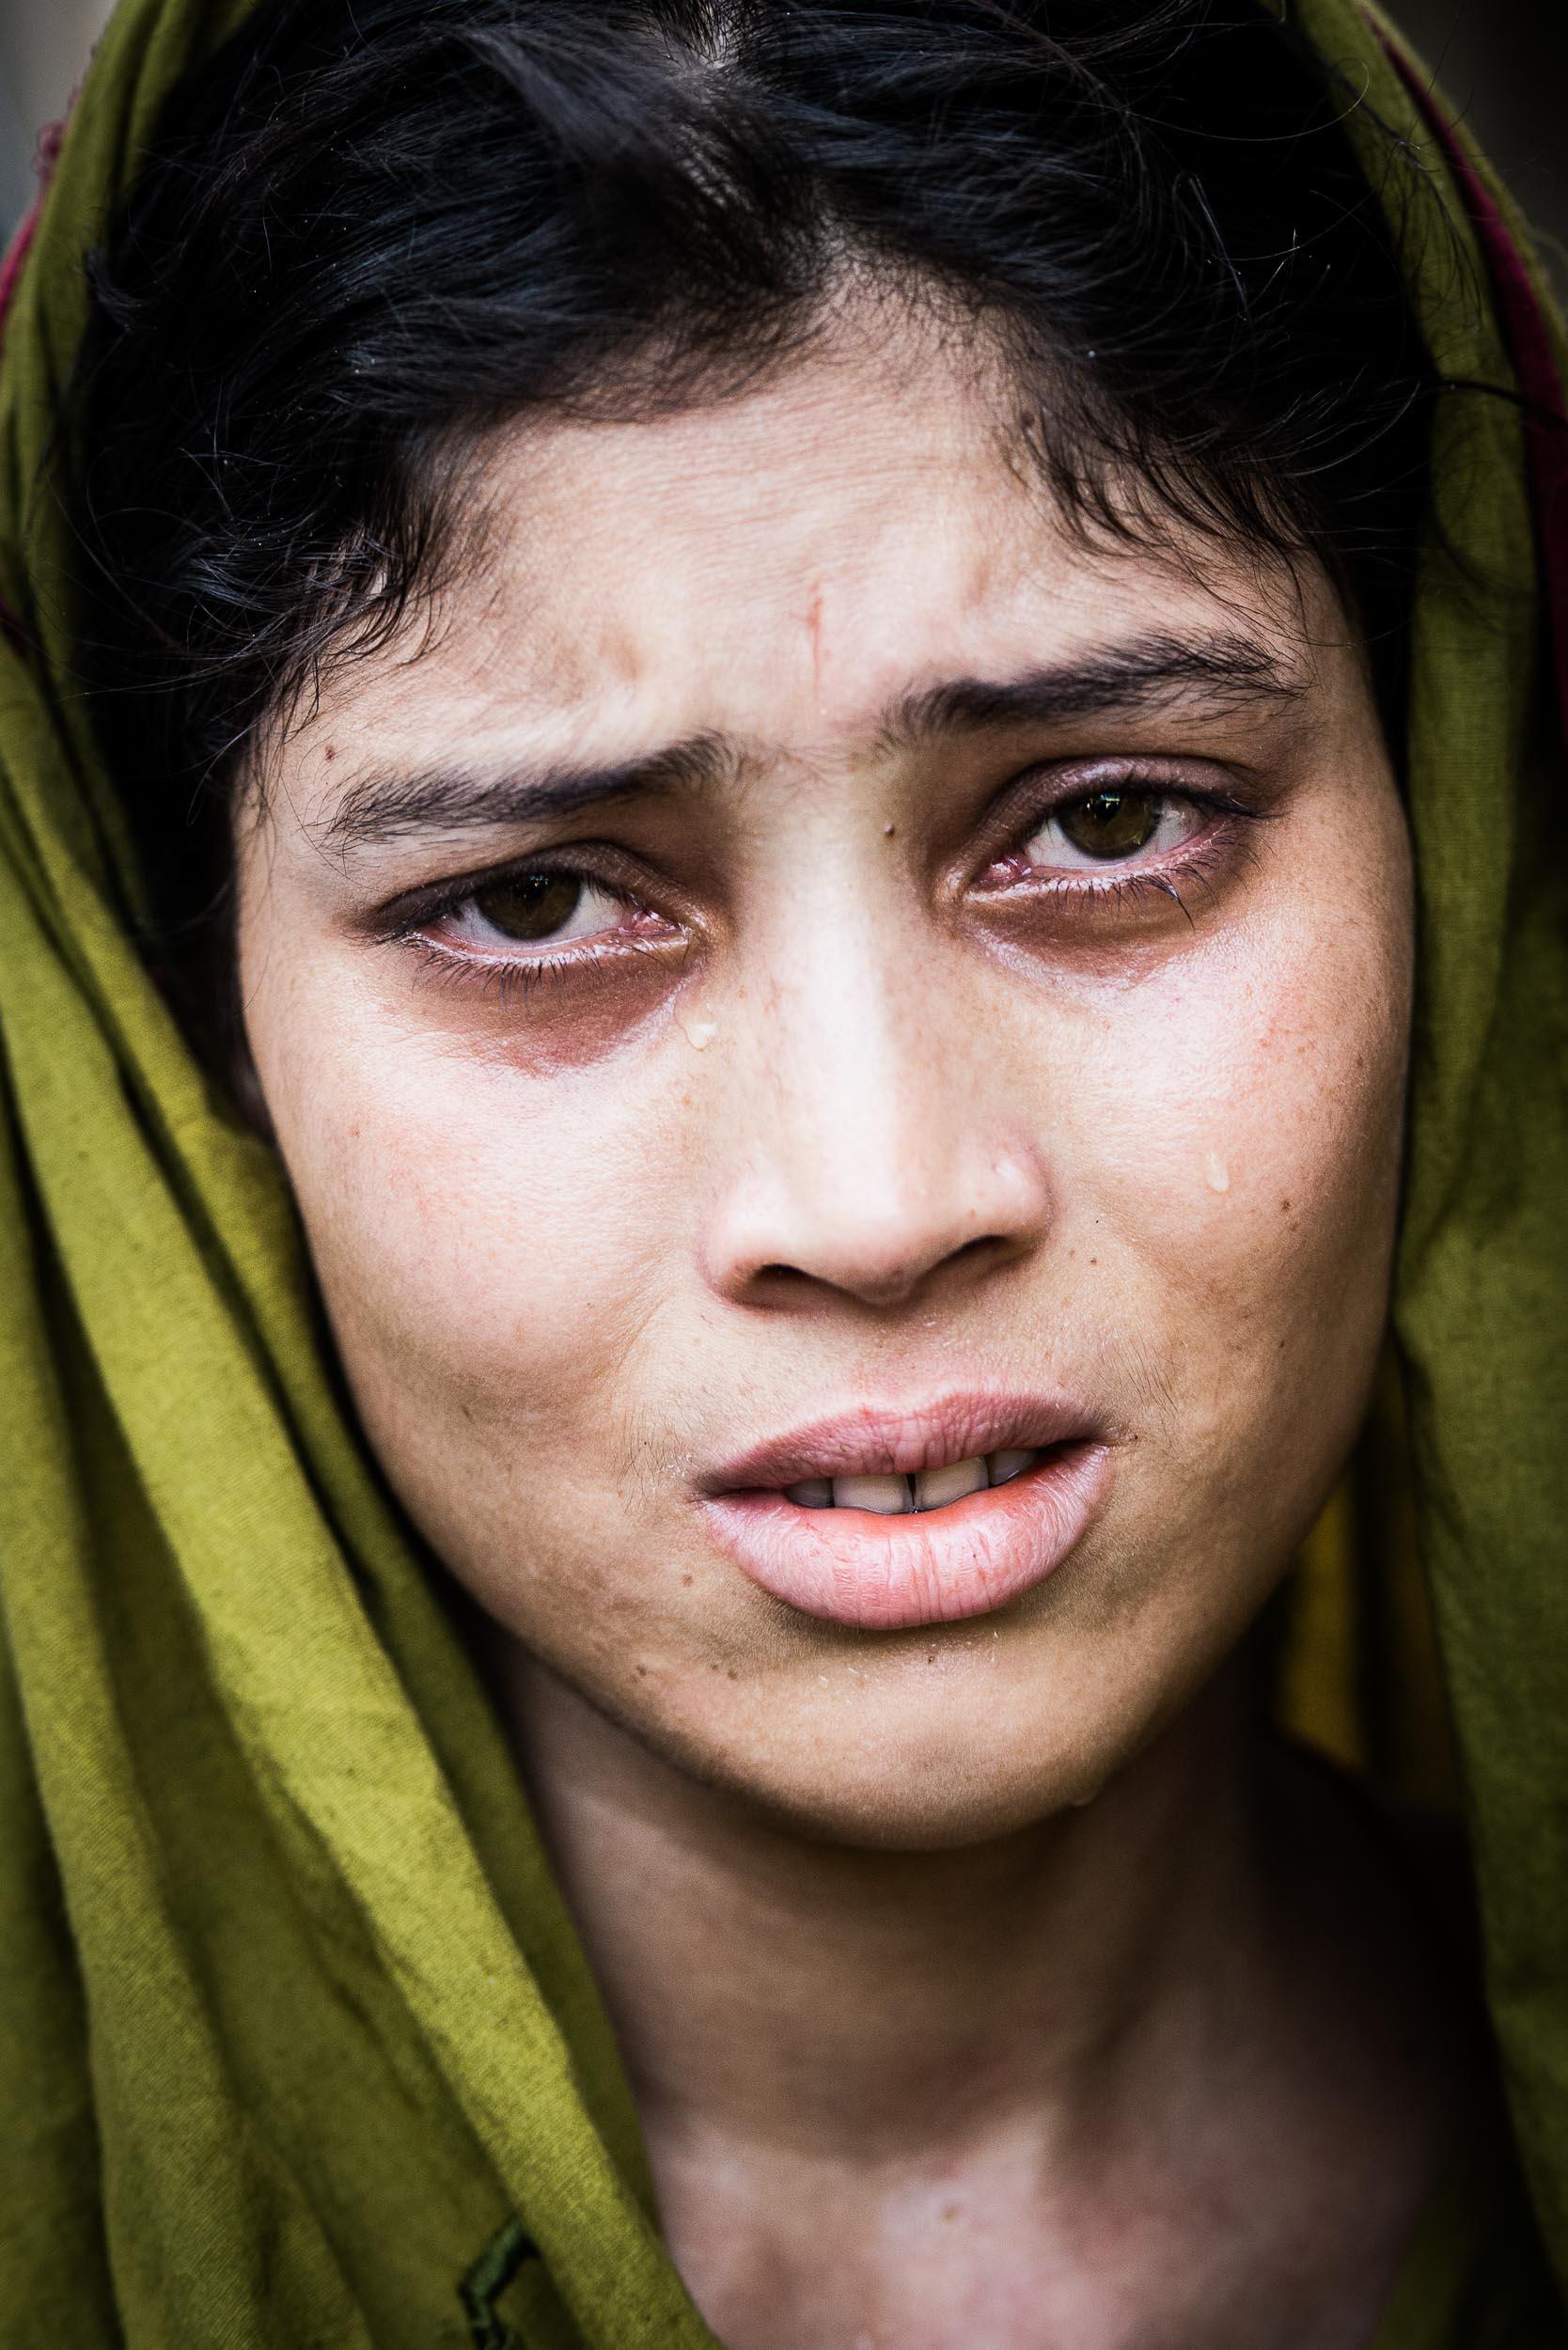 Bangladesh Rana Plaza woman - Travel - Photo credit Nicola Bailey.jpg